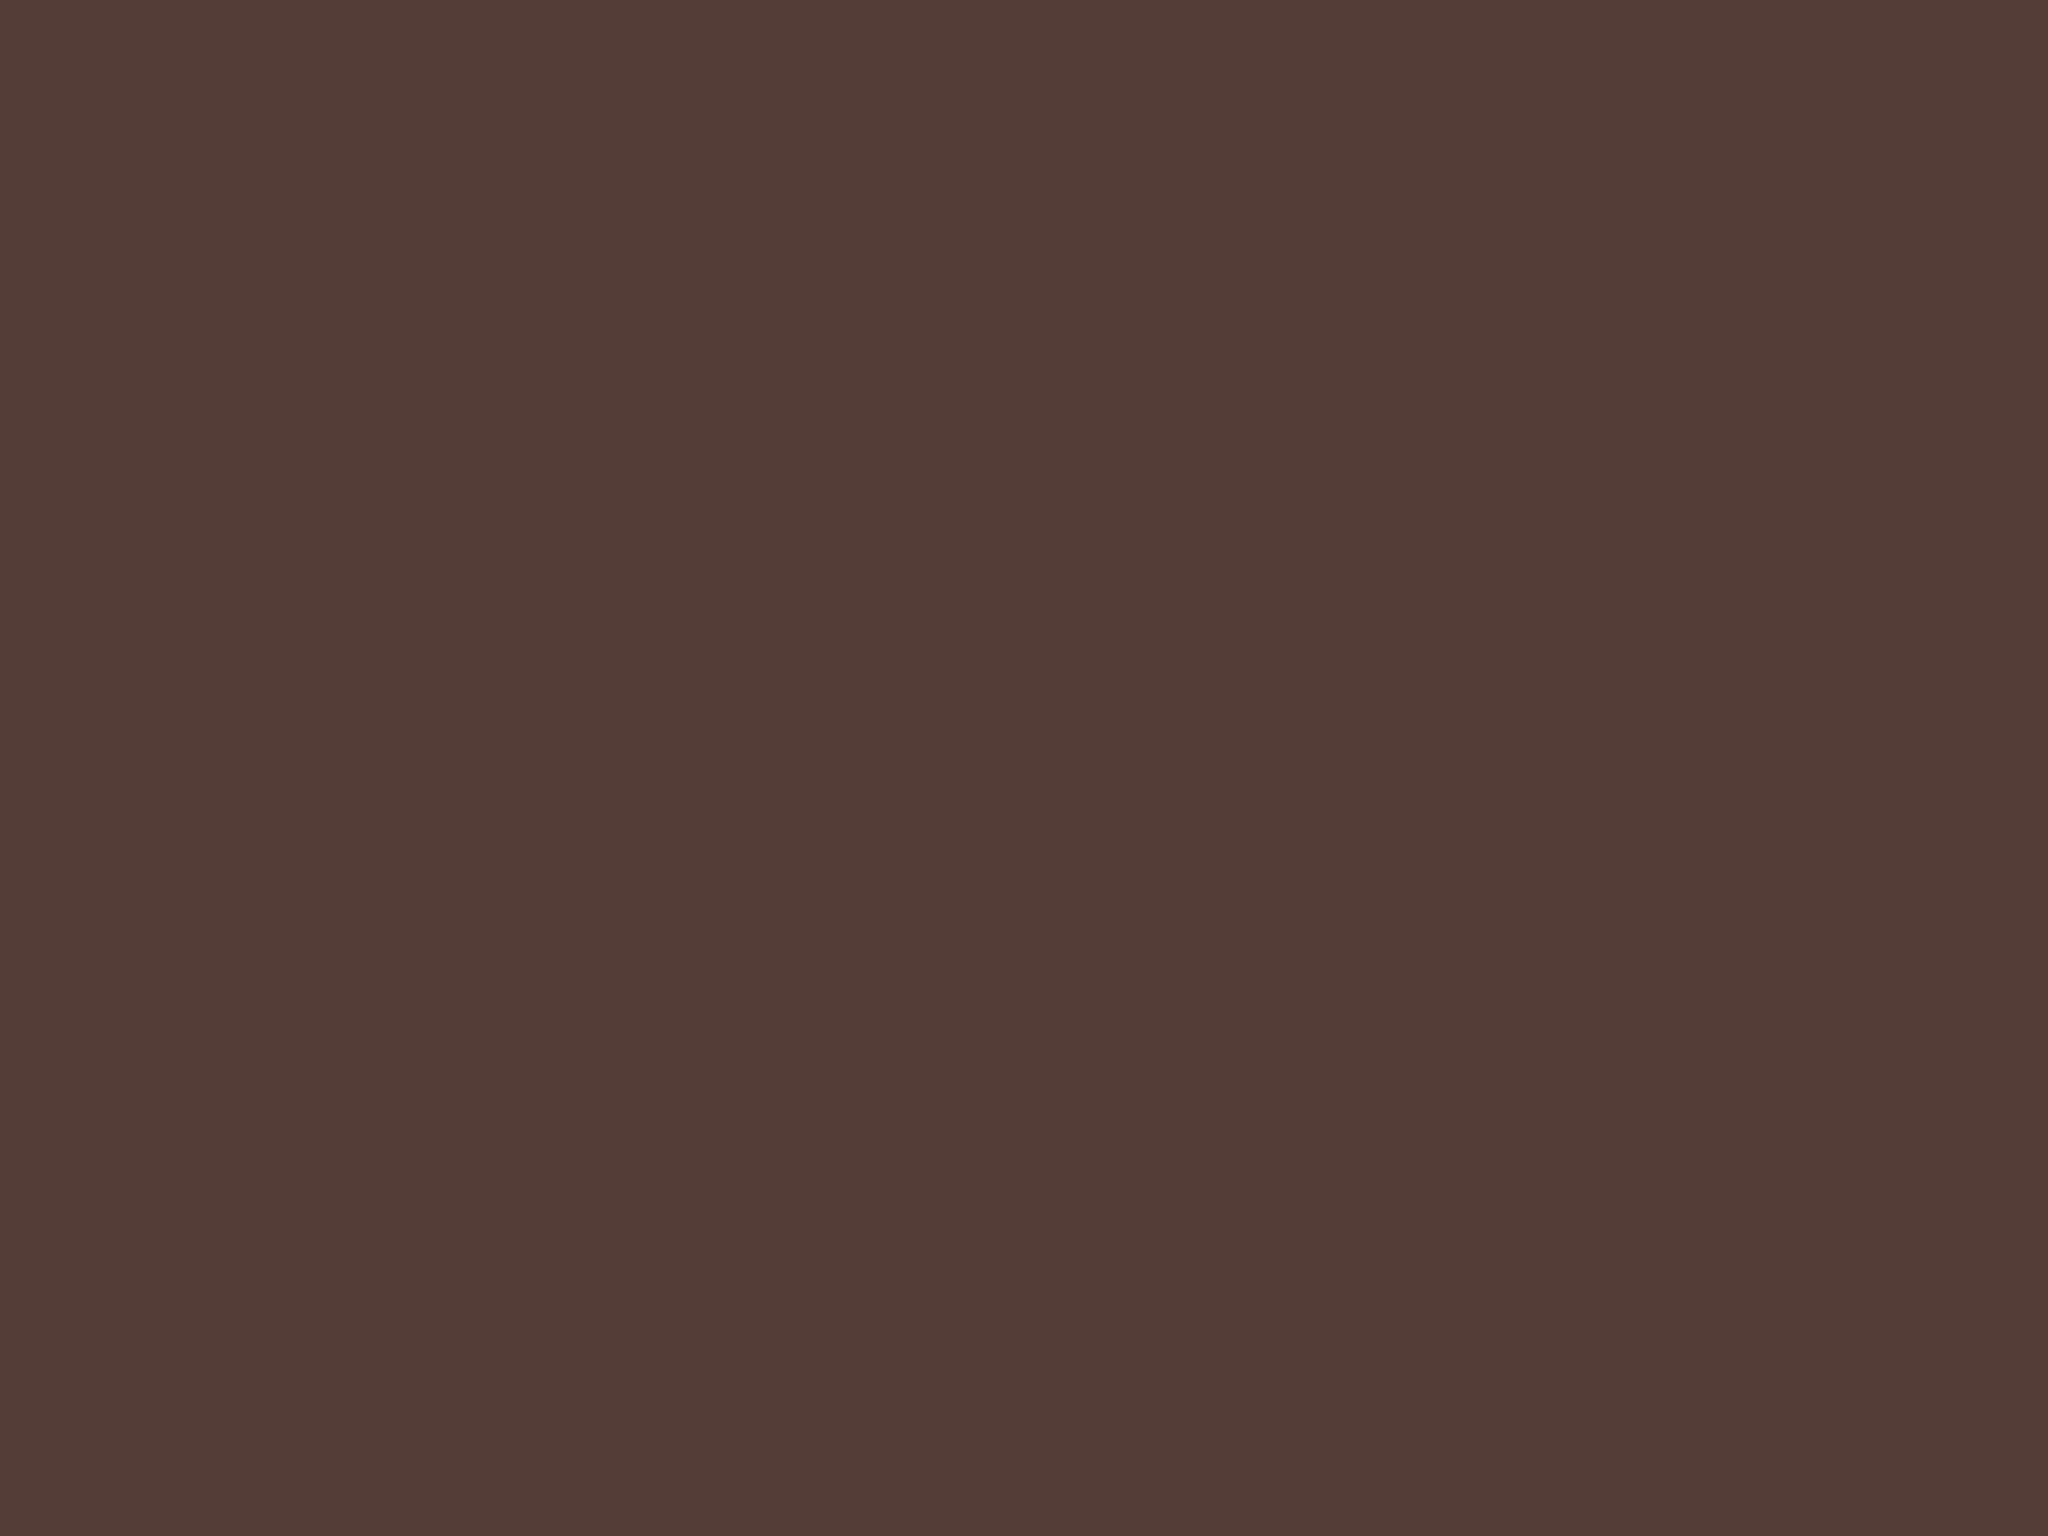 2048x1536 Dark Liver Horses Solid Color Background